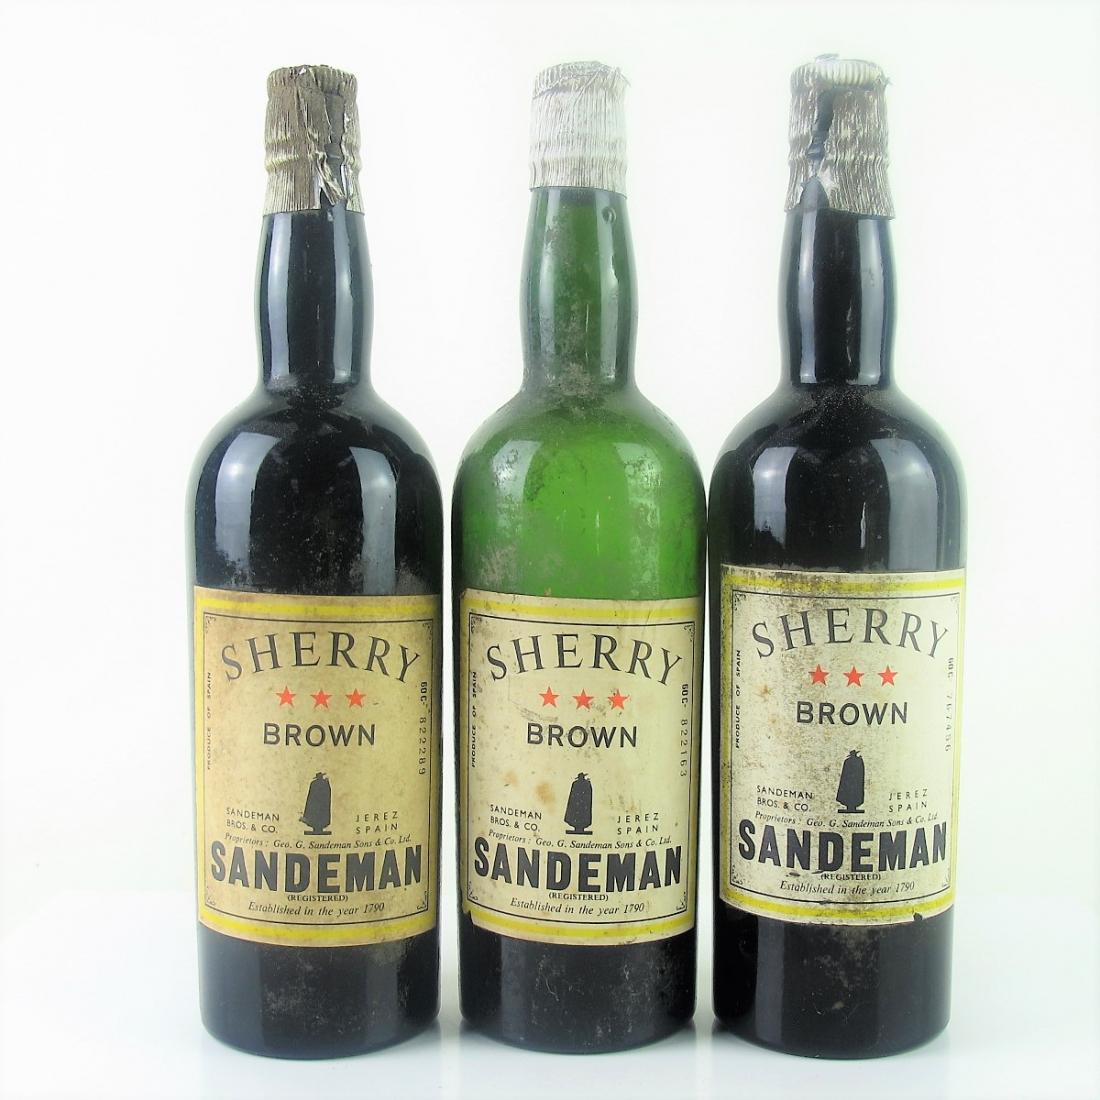 Sandeman 3 Star Brown Sherry 3x75cl